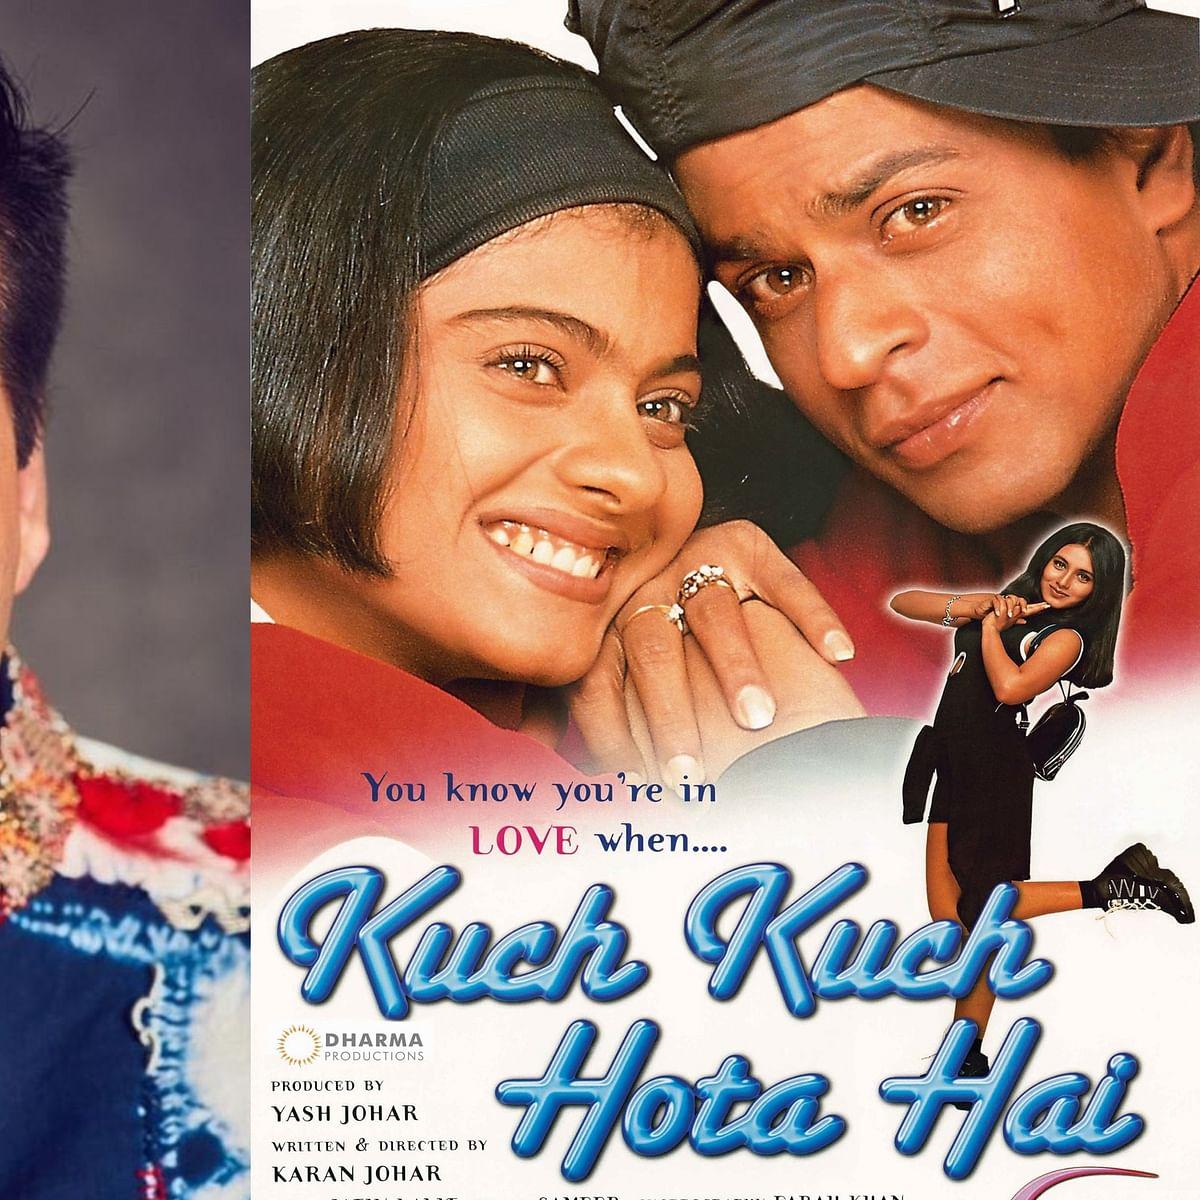 'Kuch Kuch Hota Hai' lacked logic, Shah Rukh's character had no spine: KJo